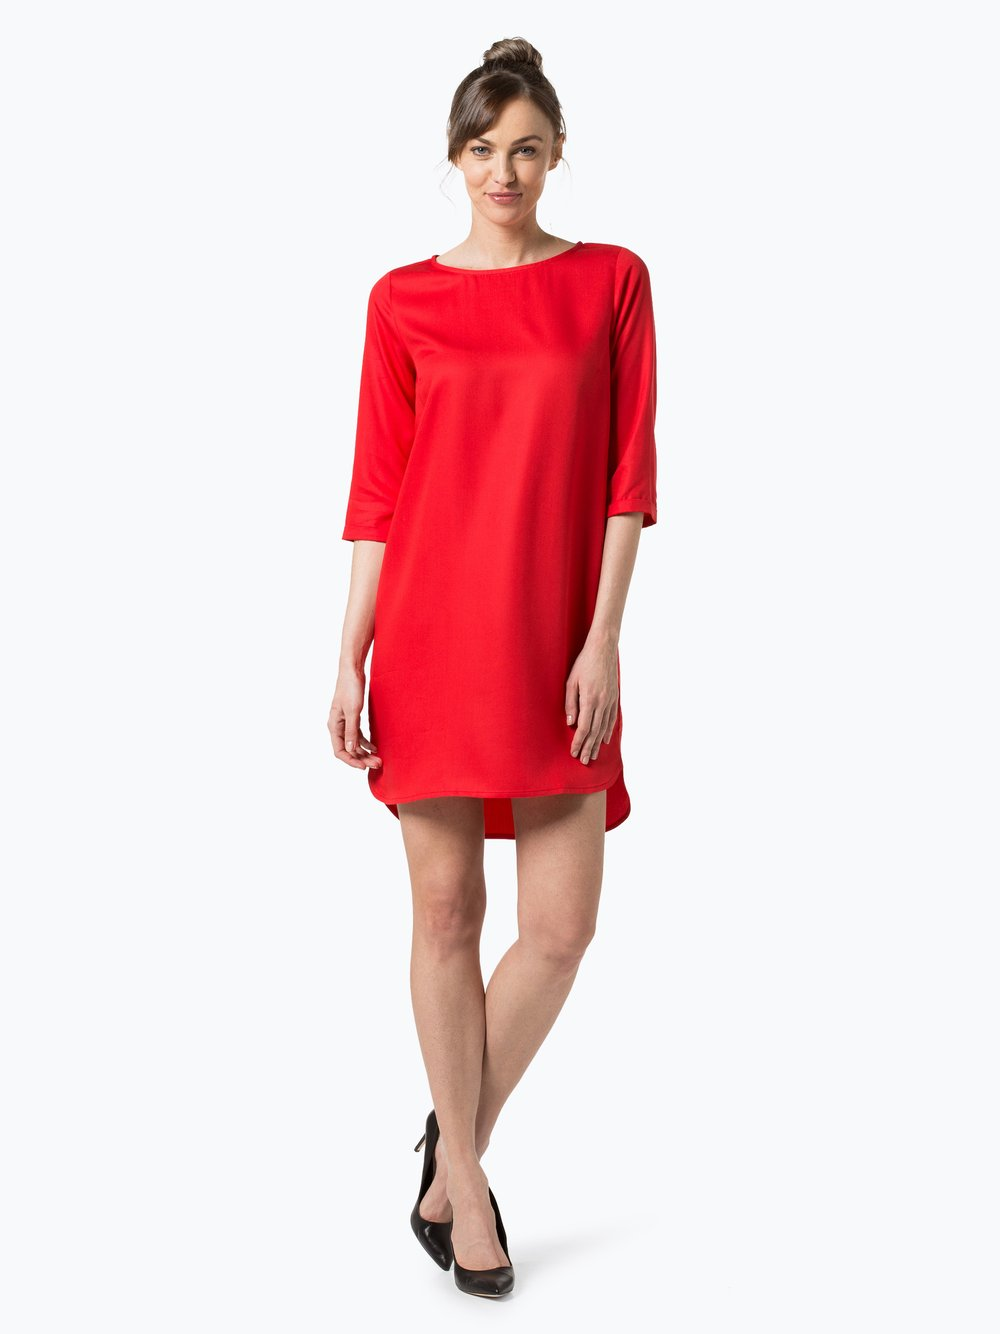 Kleid rot peek & cloppenburg